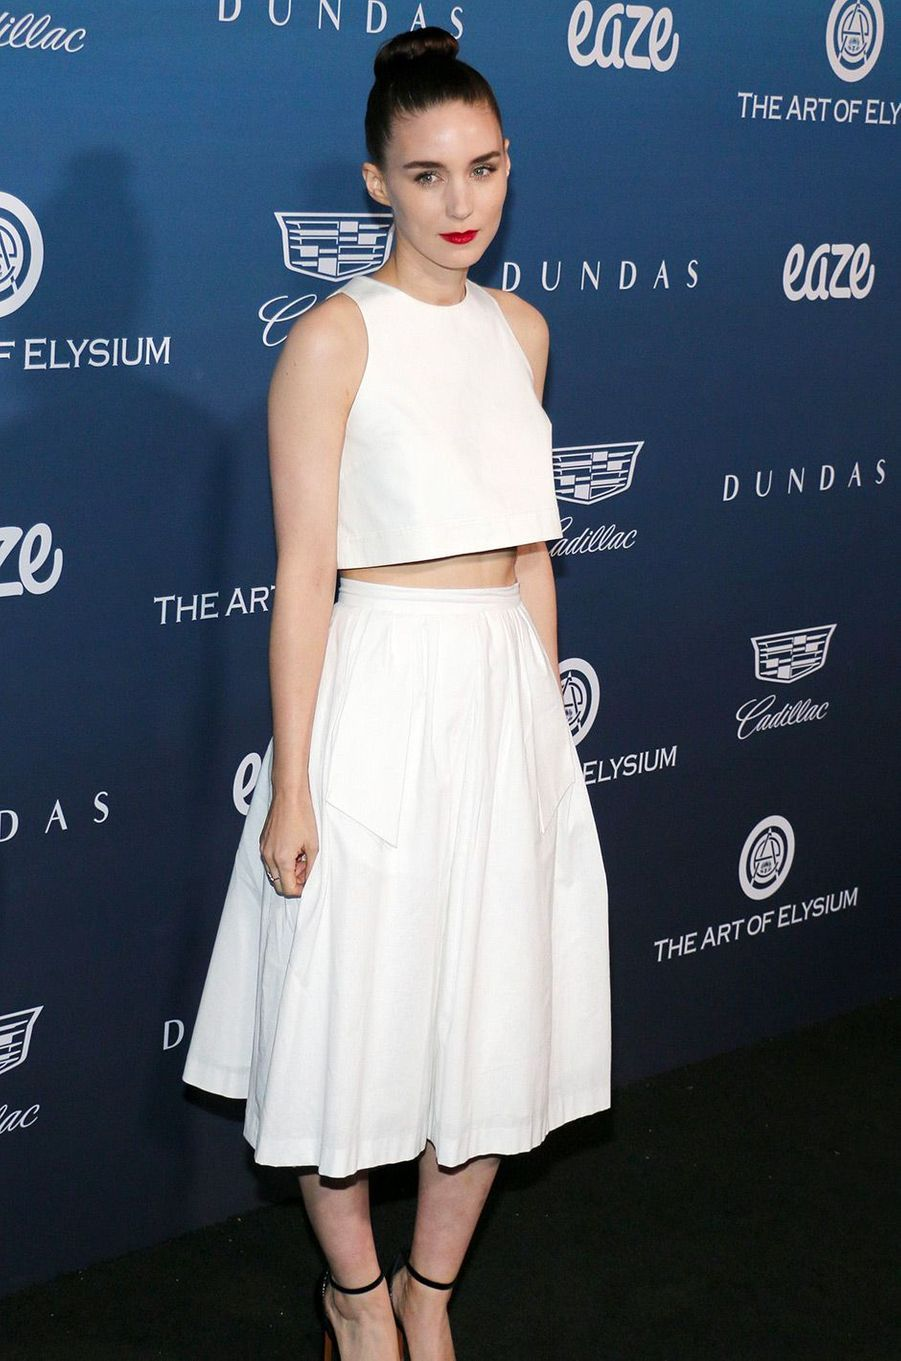 Rooney Mara au gala Art of Elysium, à Los Angeles, samedi 5 janvier